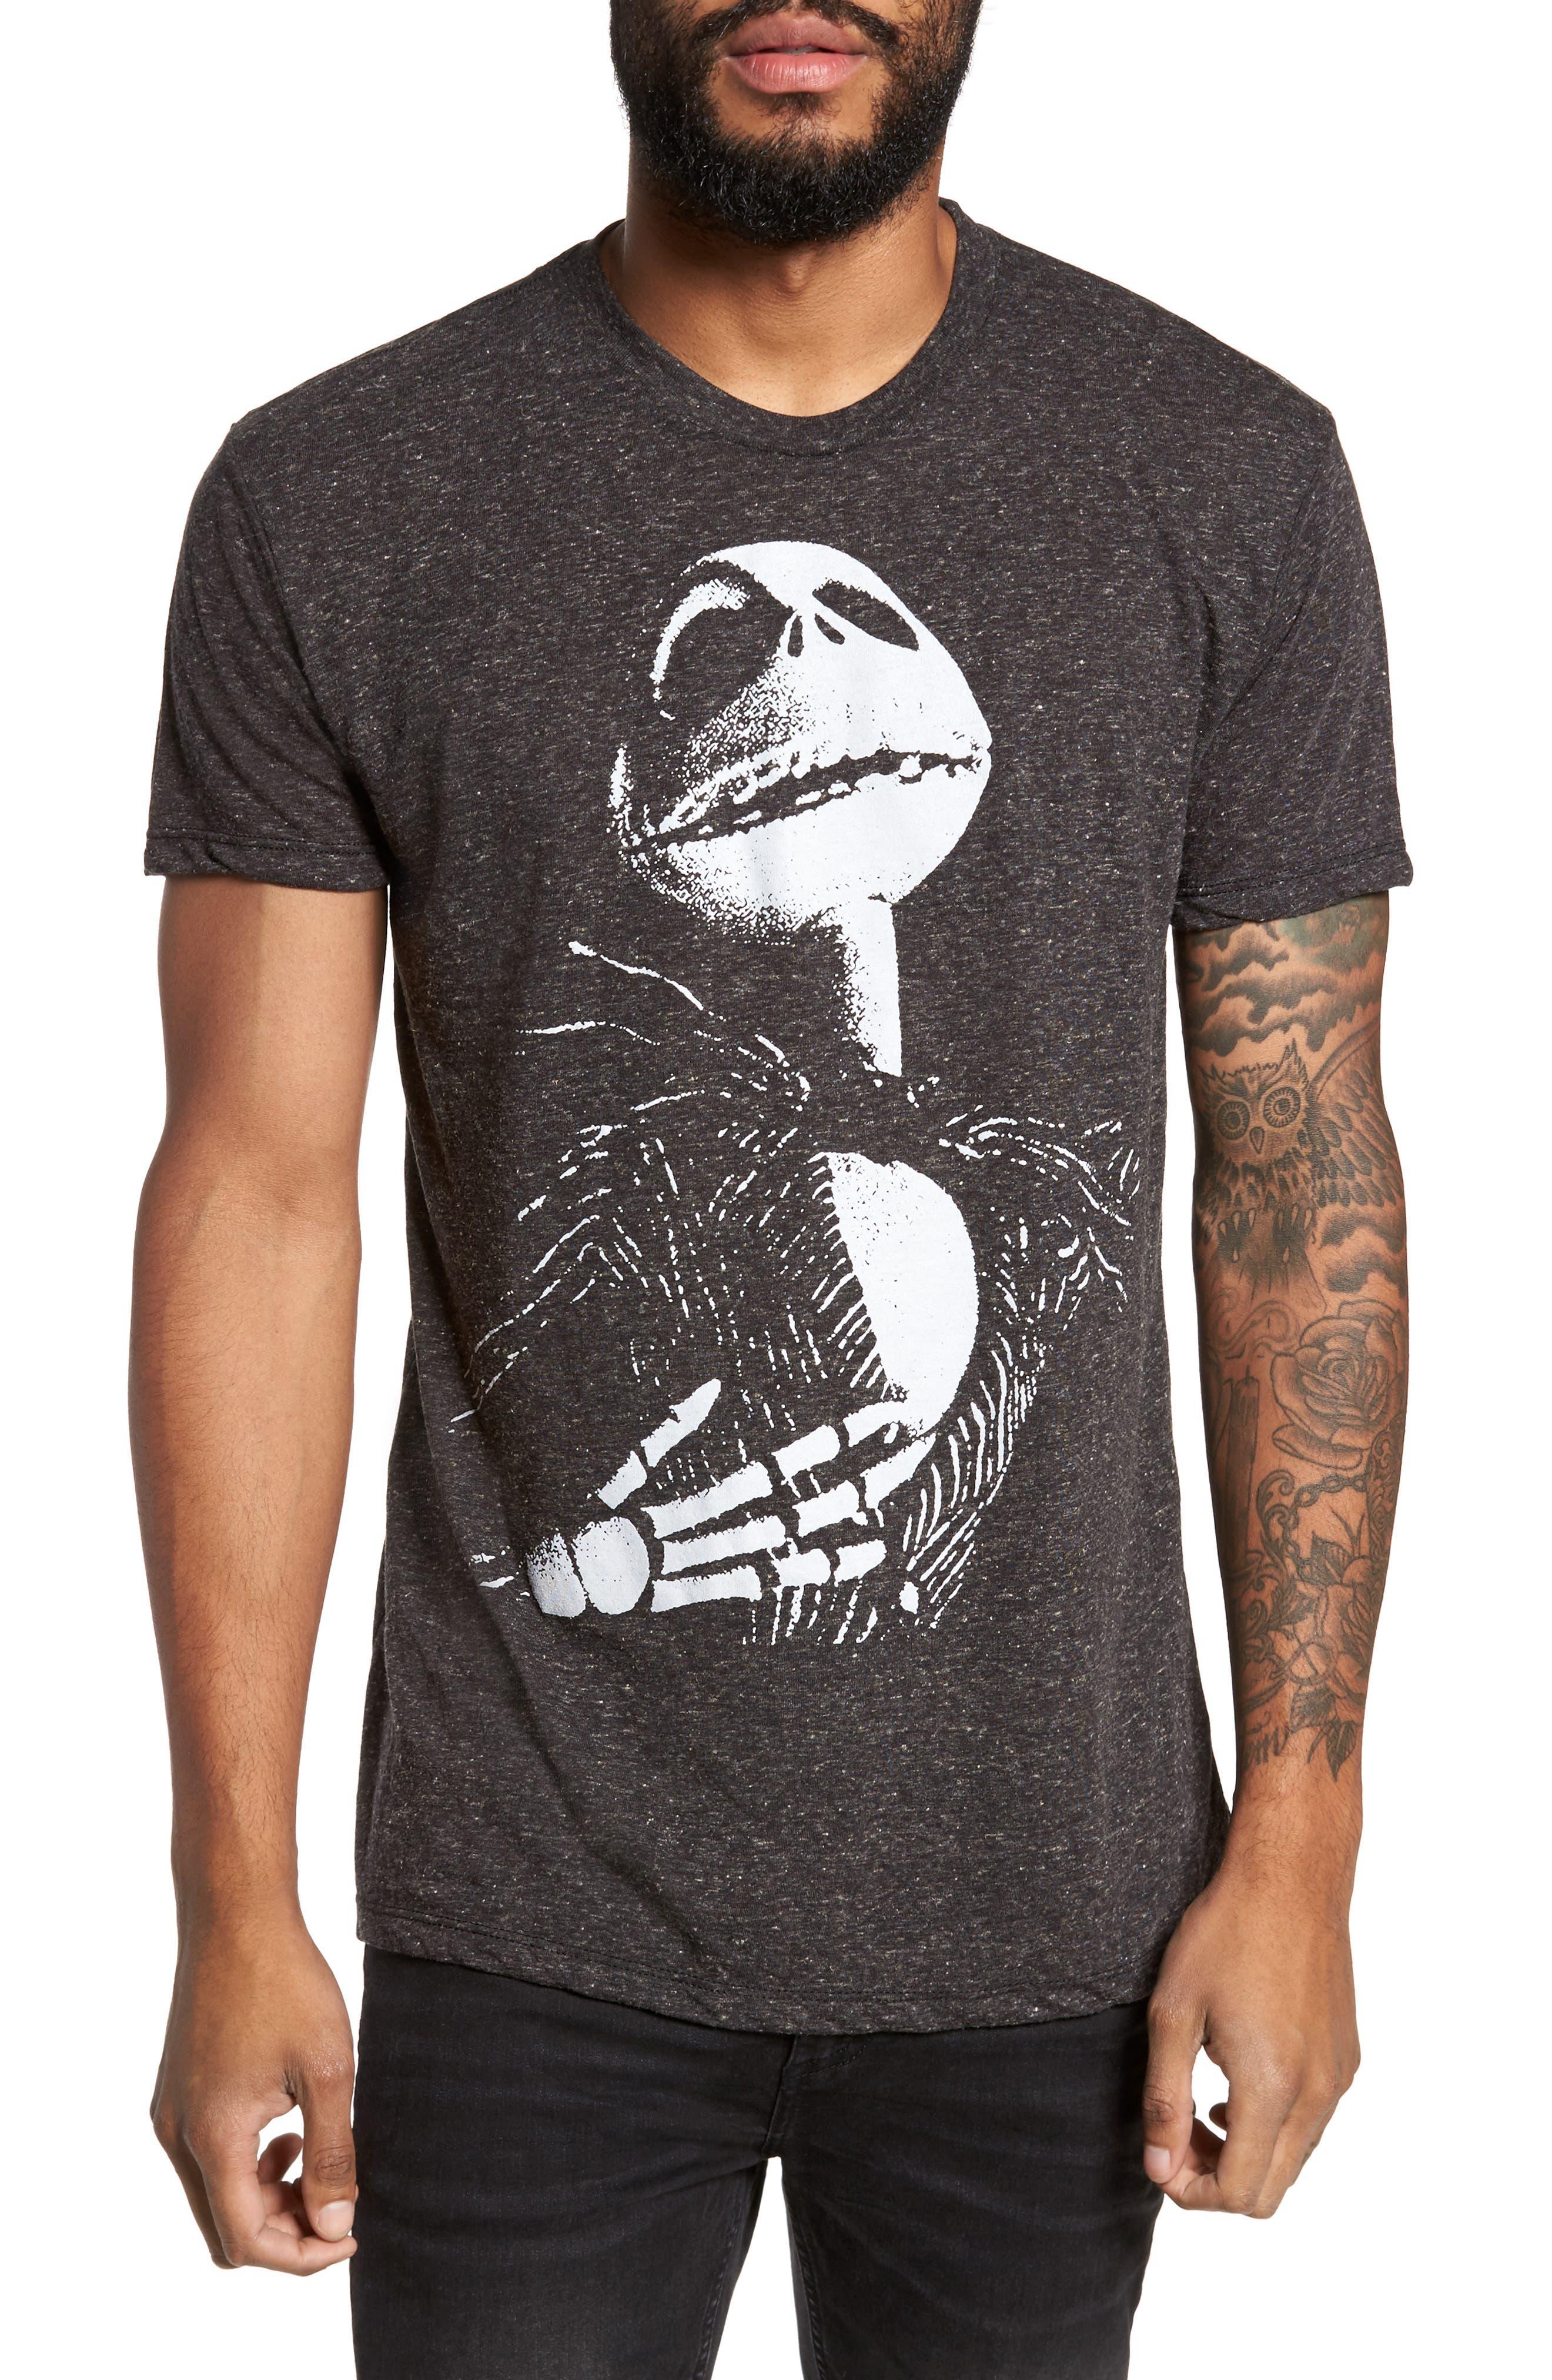 The Rail Nightmare Before Christmas Graphic T-Shirt